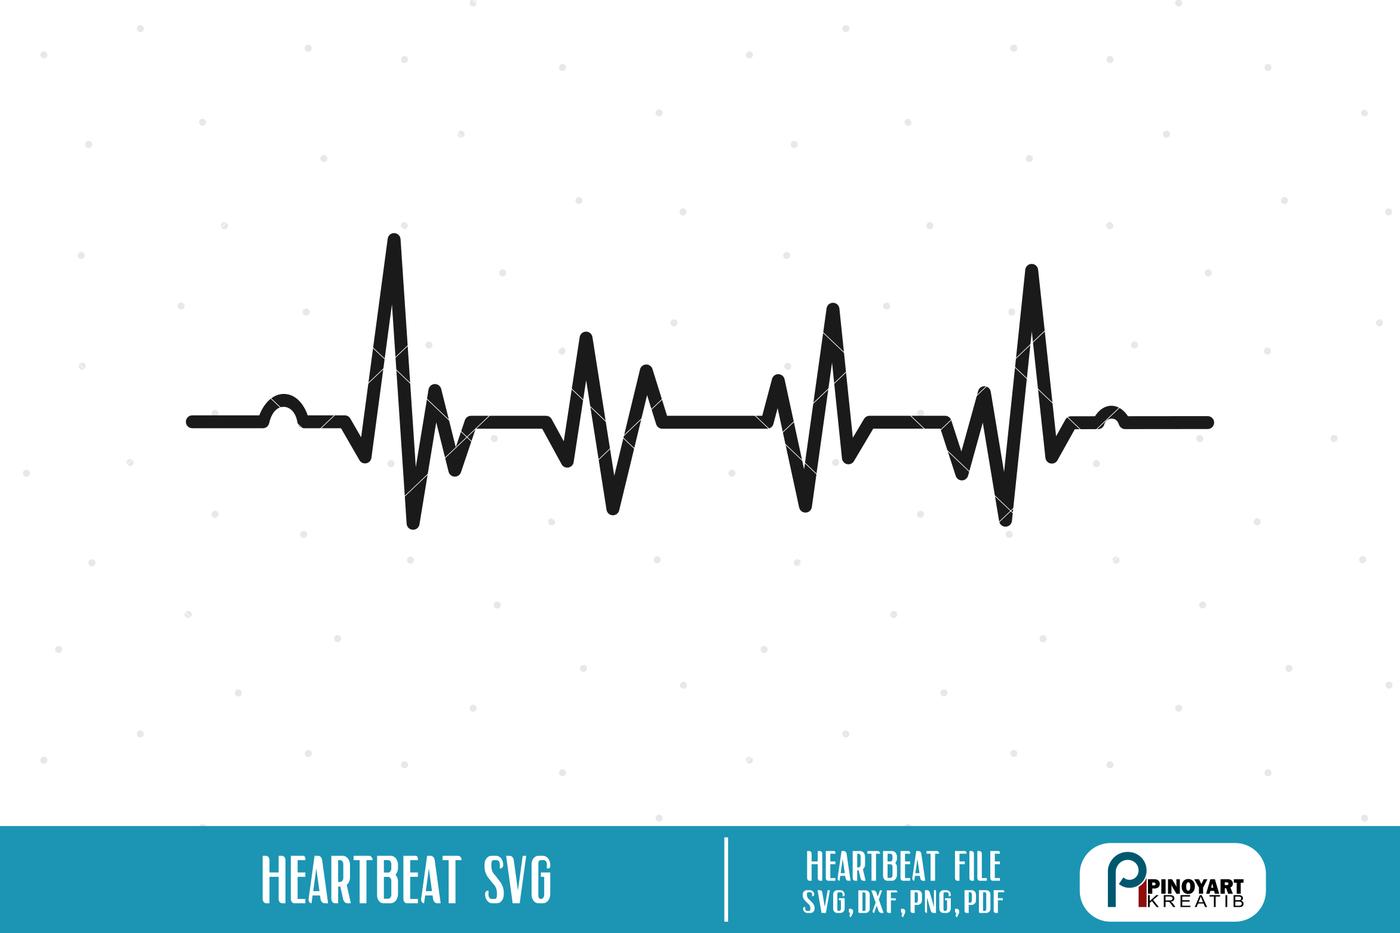 Heartbeat Svg Ekg Svg Ecg Svg Lifeline Svg Heartbeat Clip Art